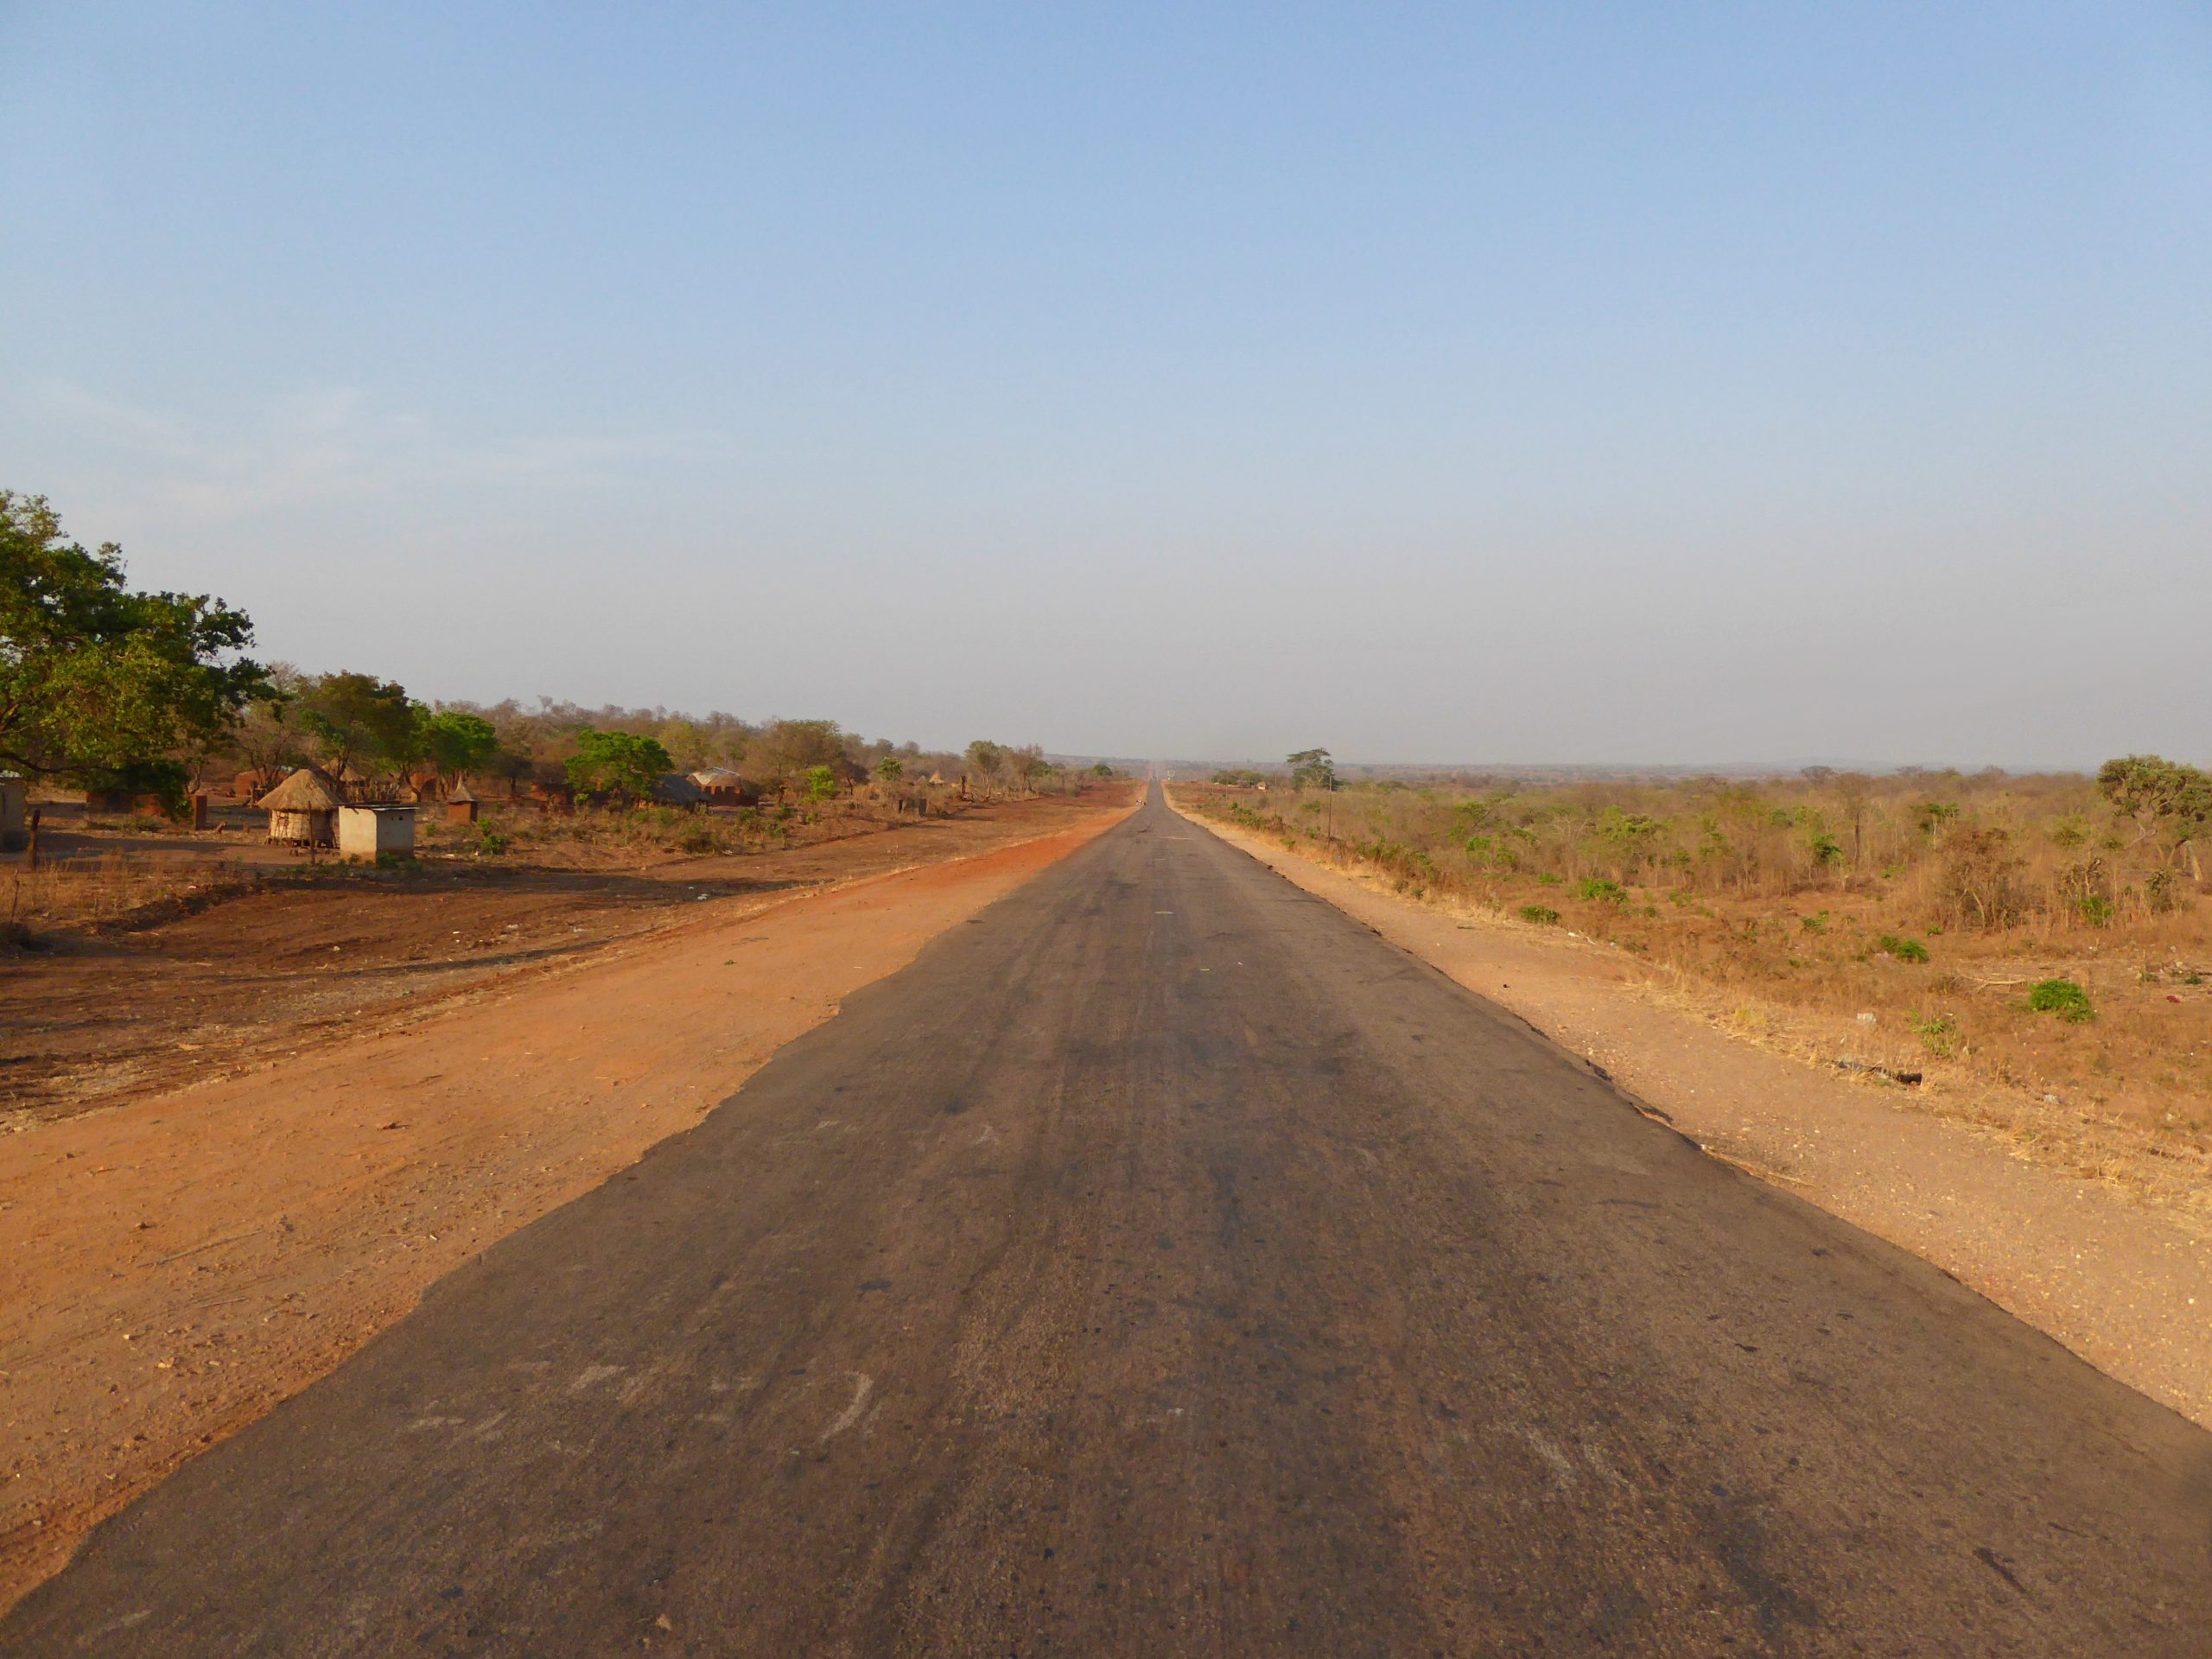 Radreise Afrika 2014 - Great East Road